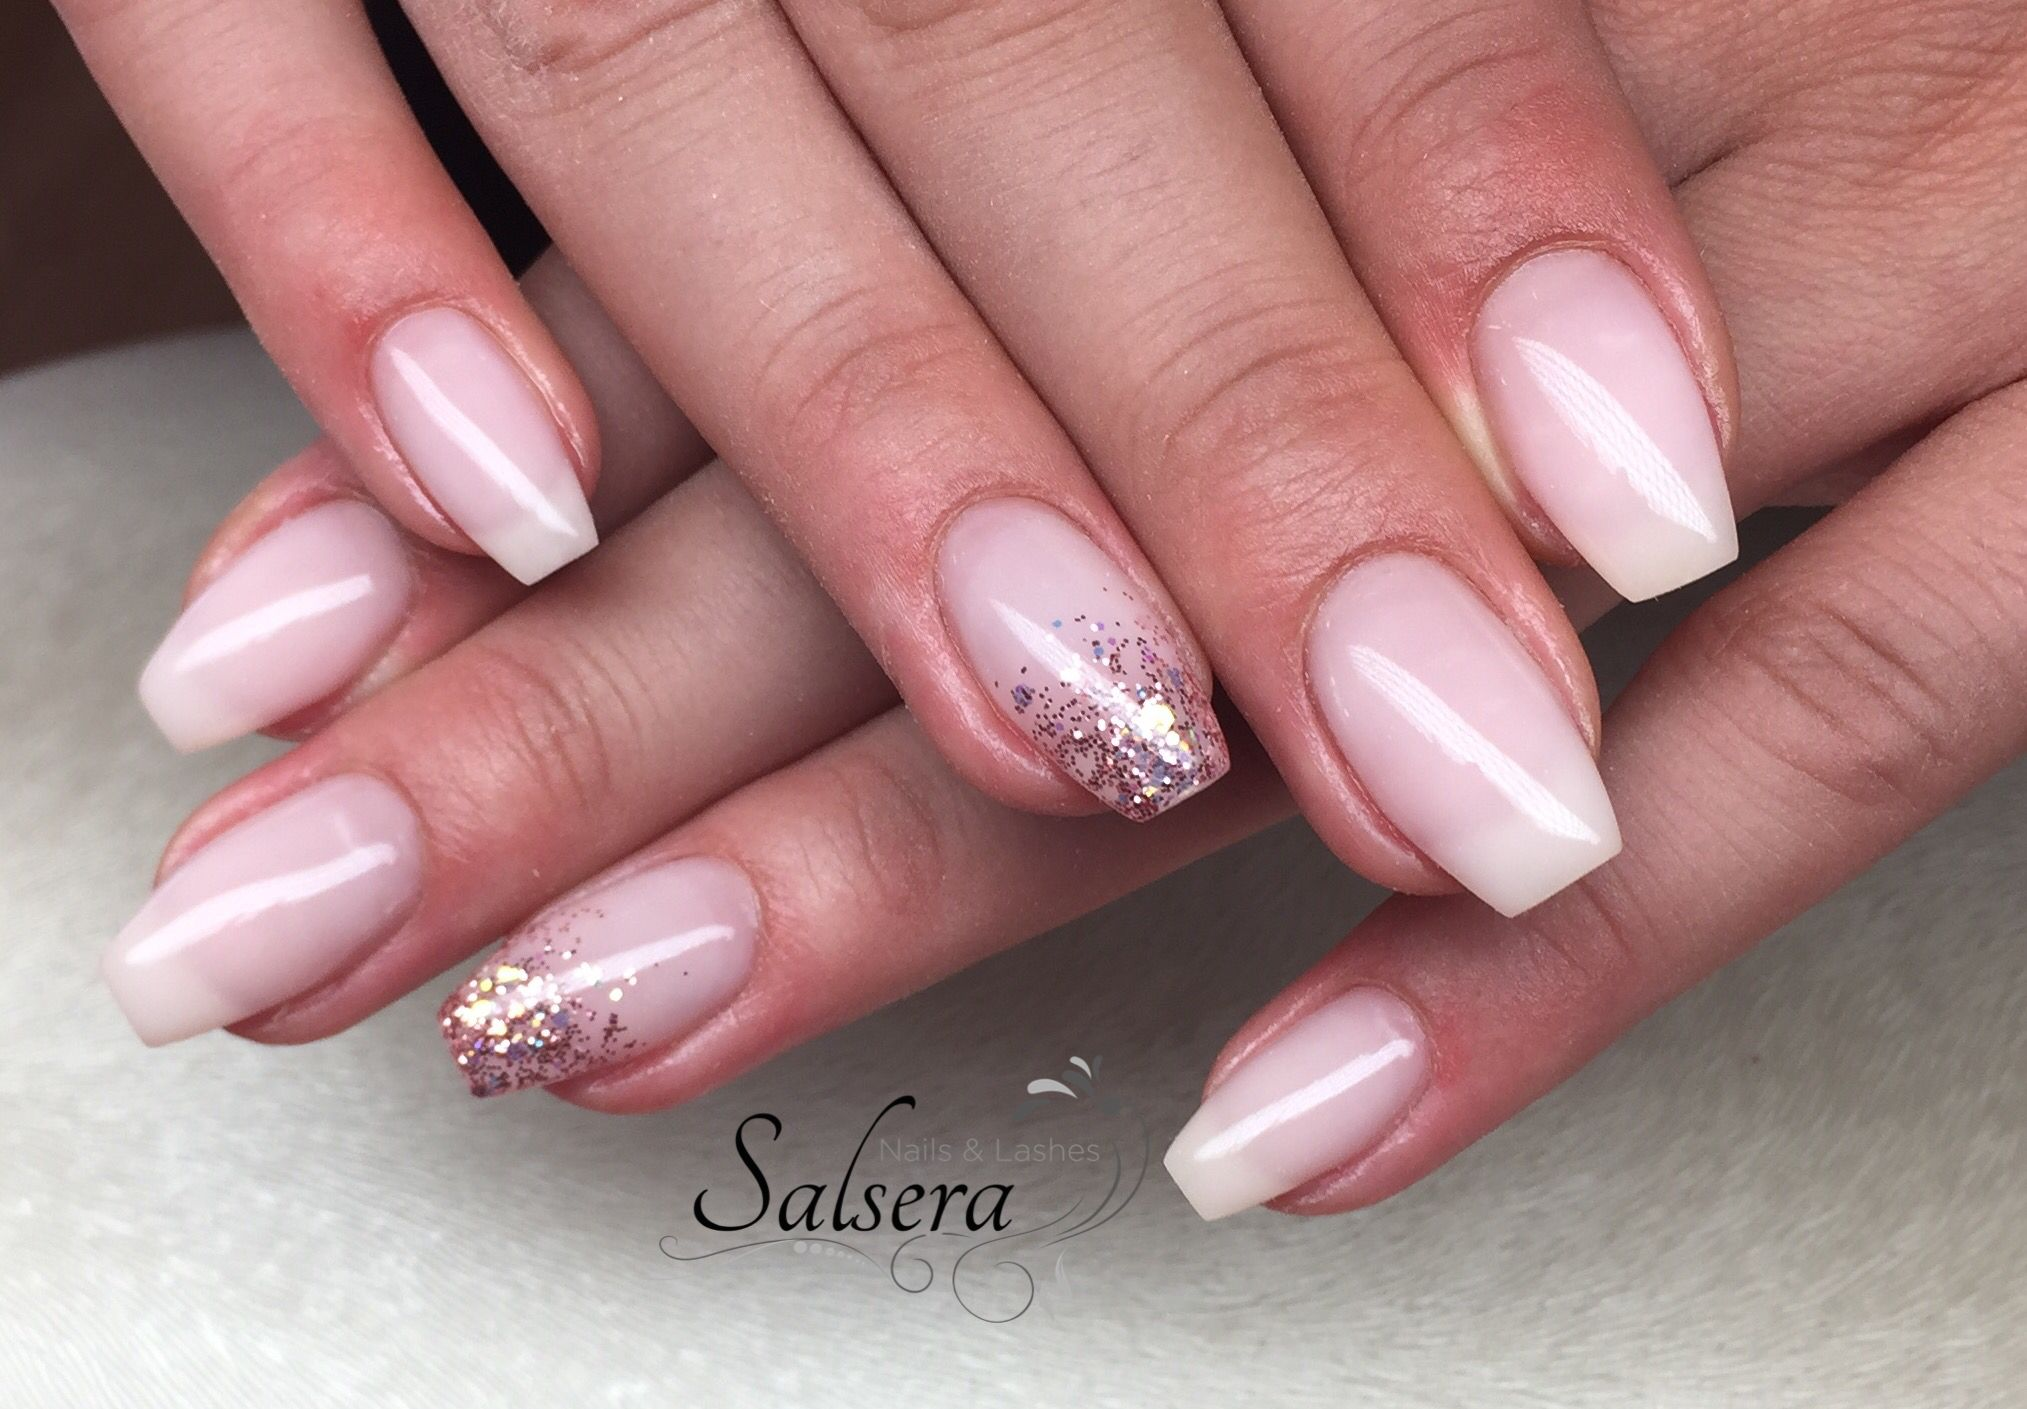 Ballerina Nails Nageldesign Gelnails Rose Milky Glitter Salsera